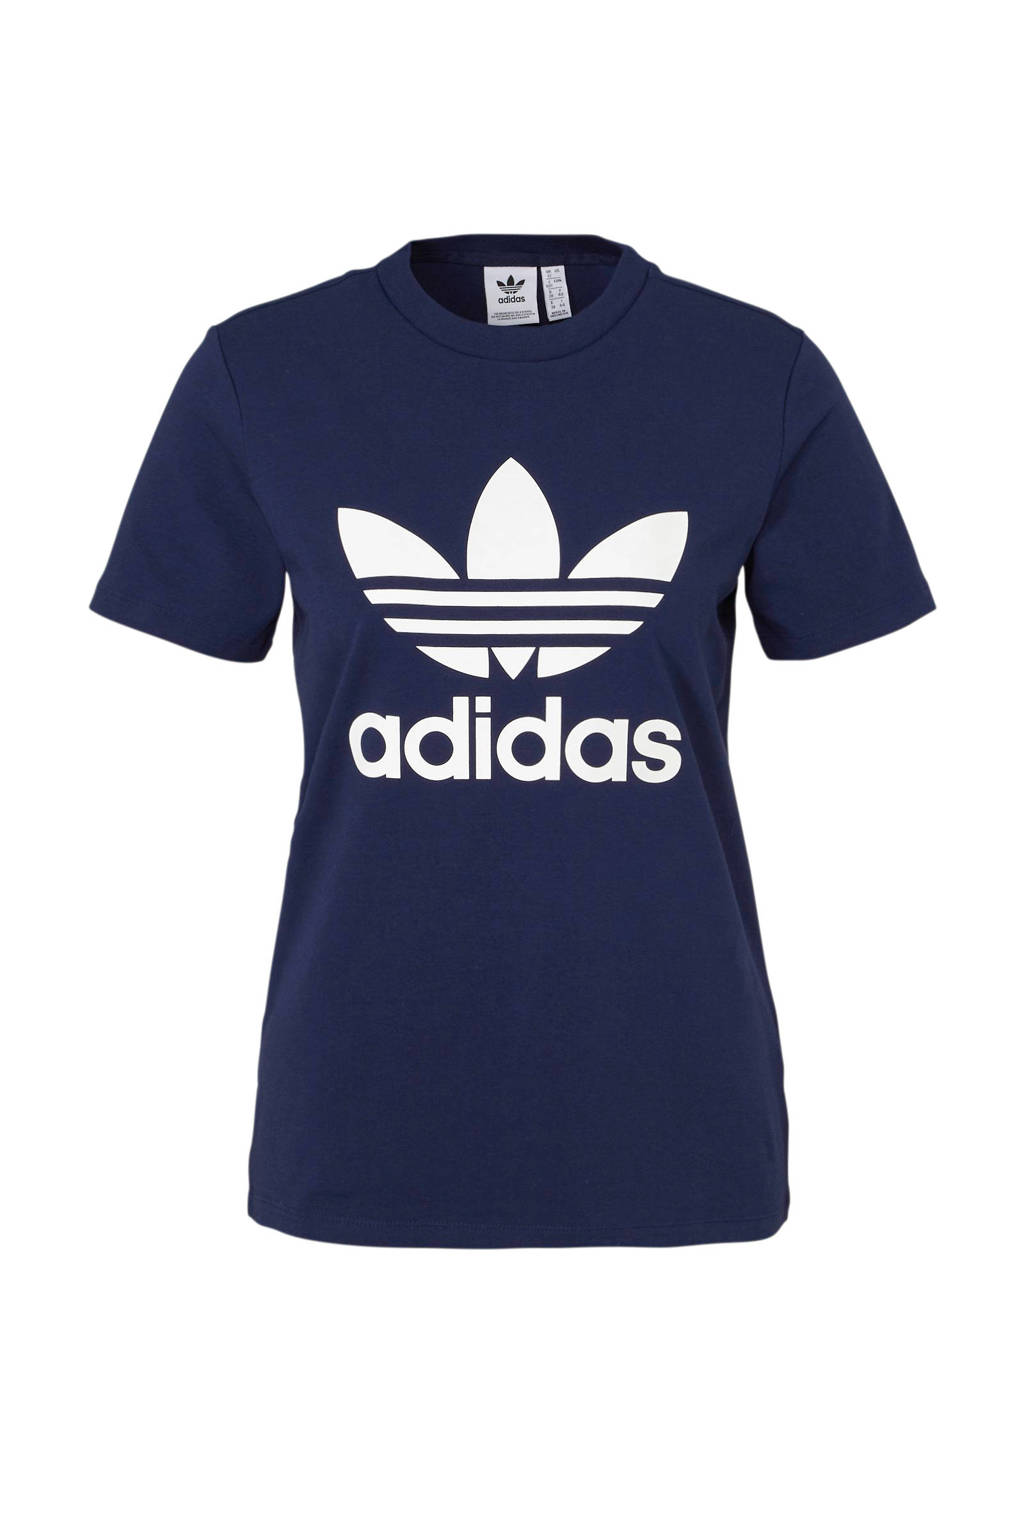 cae4d03cc38 adidas originals T-shirt donkerblauw, Donkerblauw/wit, Dames